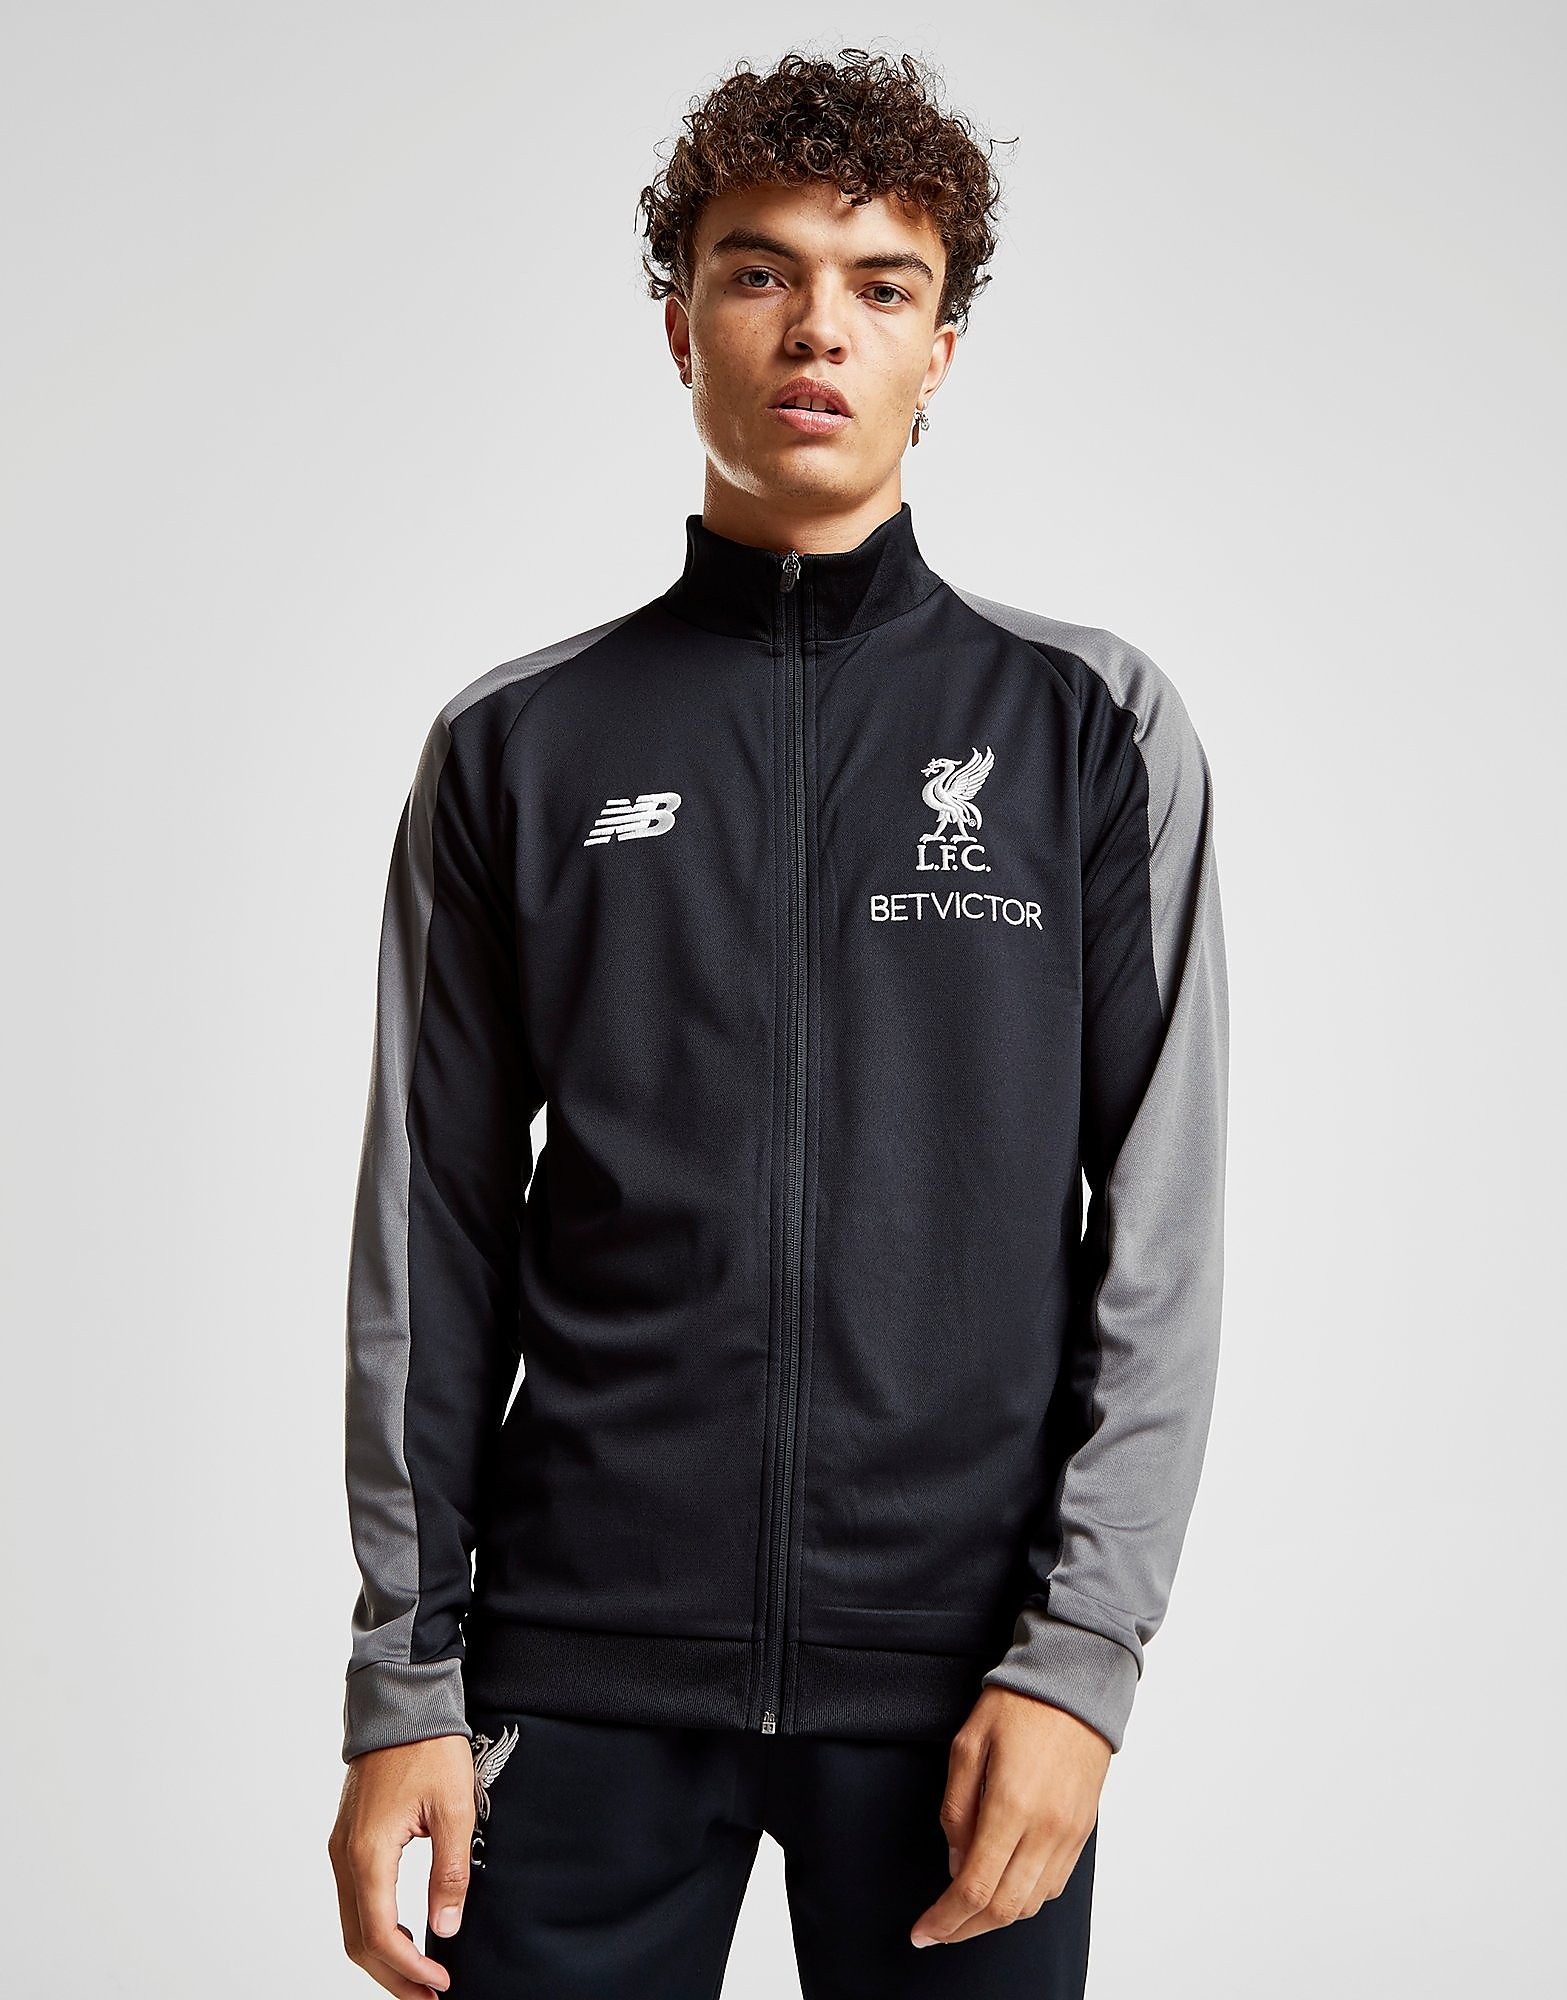 New Balance Liverpool FC Presentation Jacket